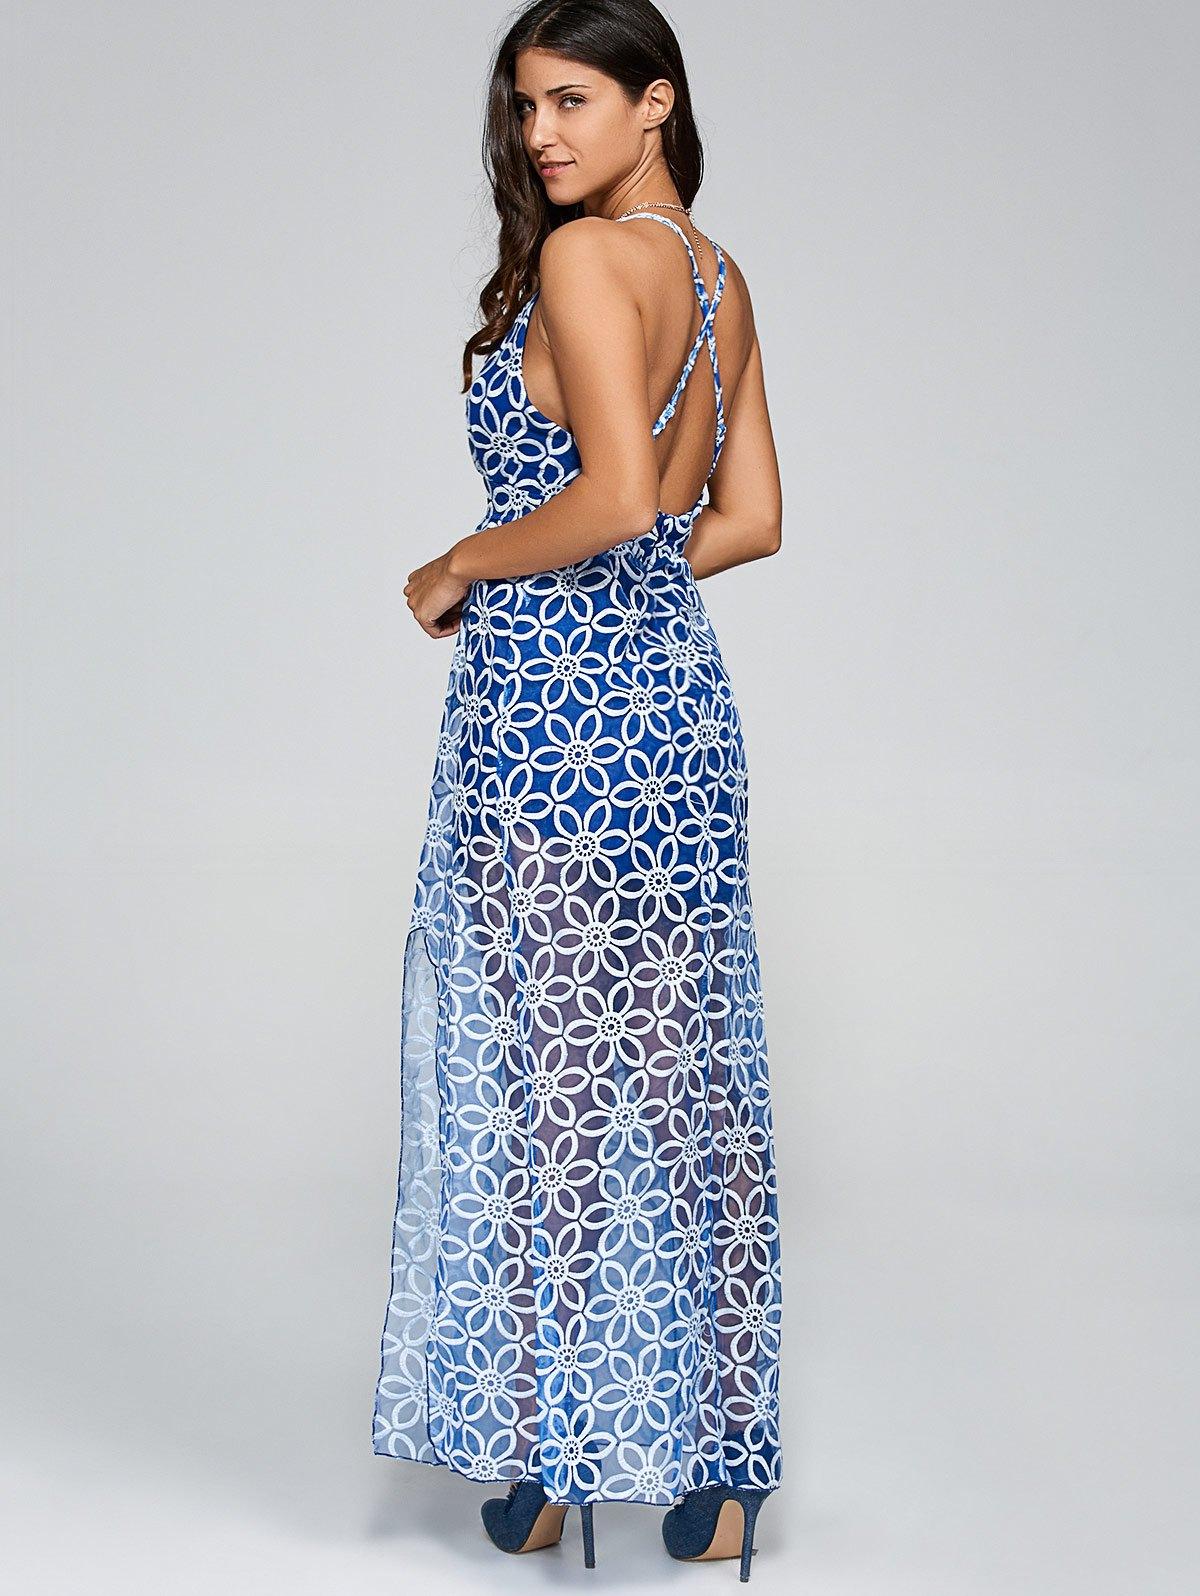 Plunging Neck Criss Back Slit Maxi DressClothes<br><br><br>Size: M<br>Color: BLUE